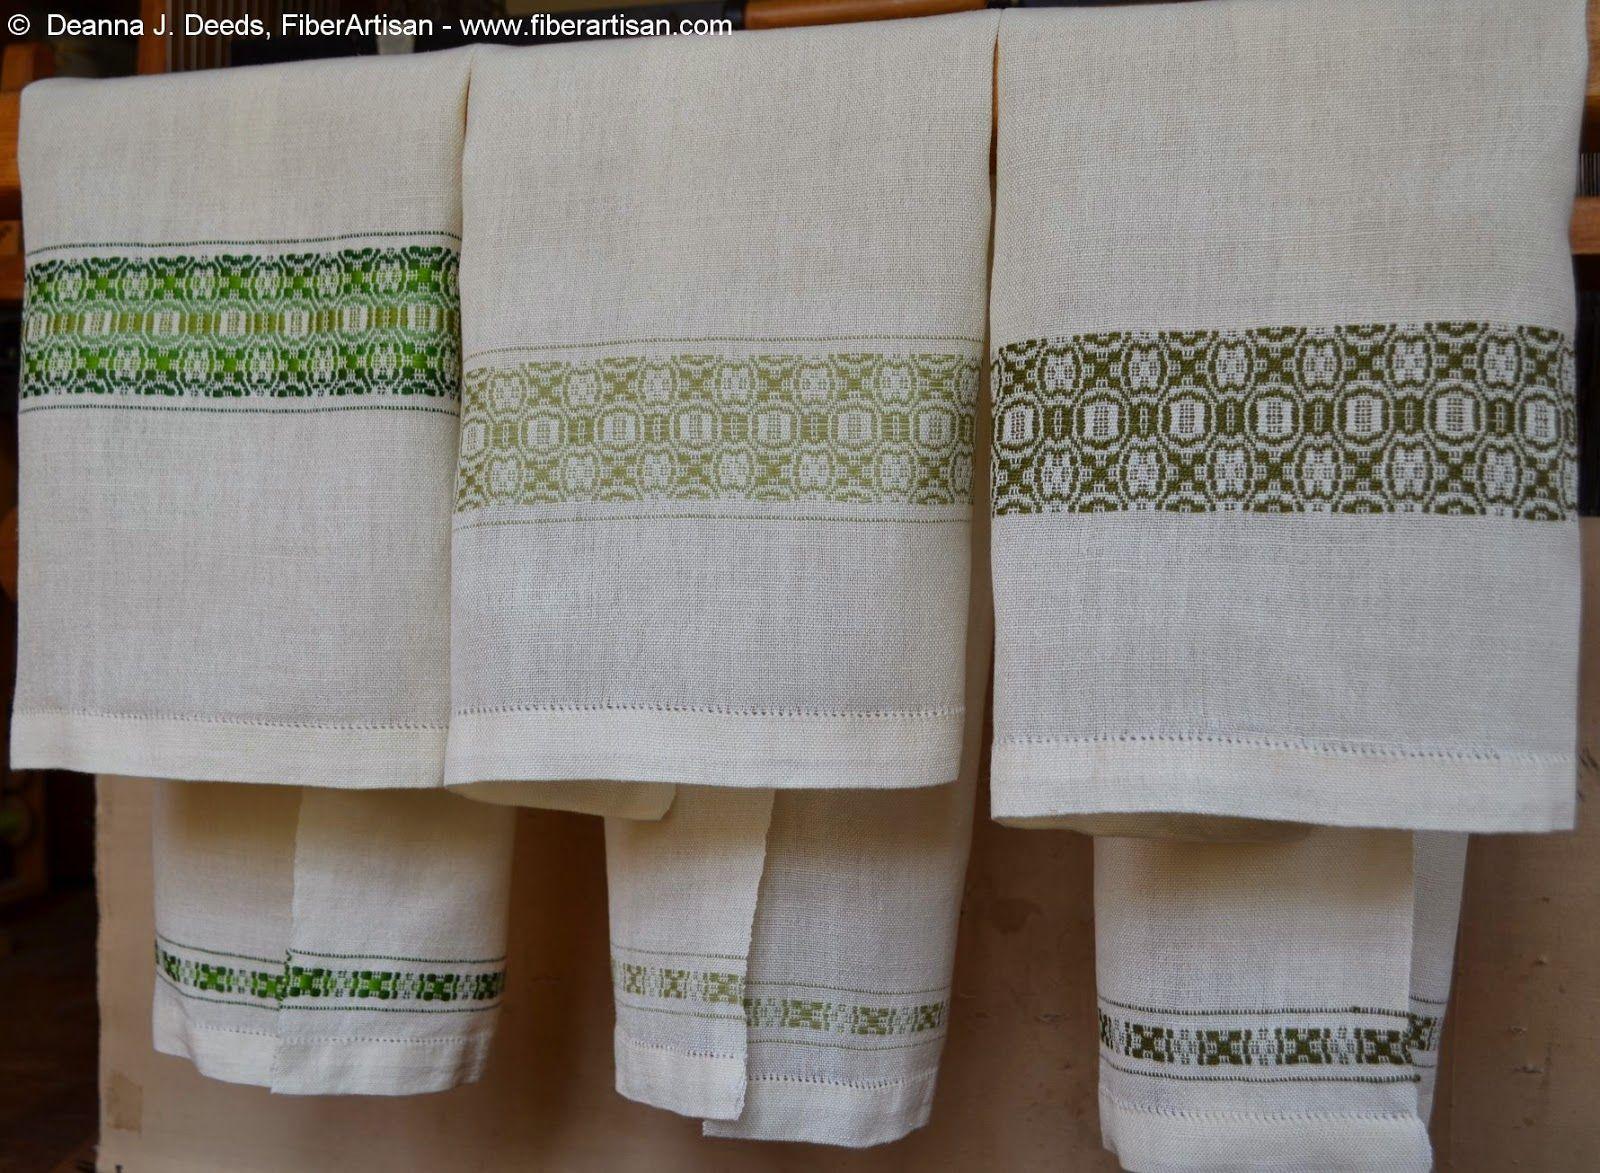 Pin de Anina Nel en Weaving   Pinterest   Toallas y Telar